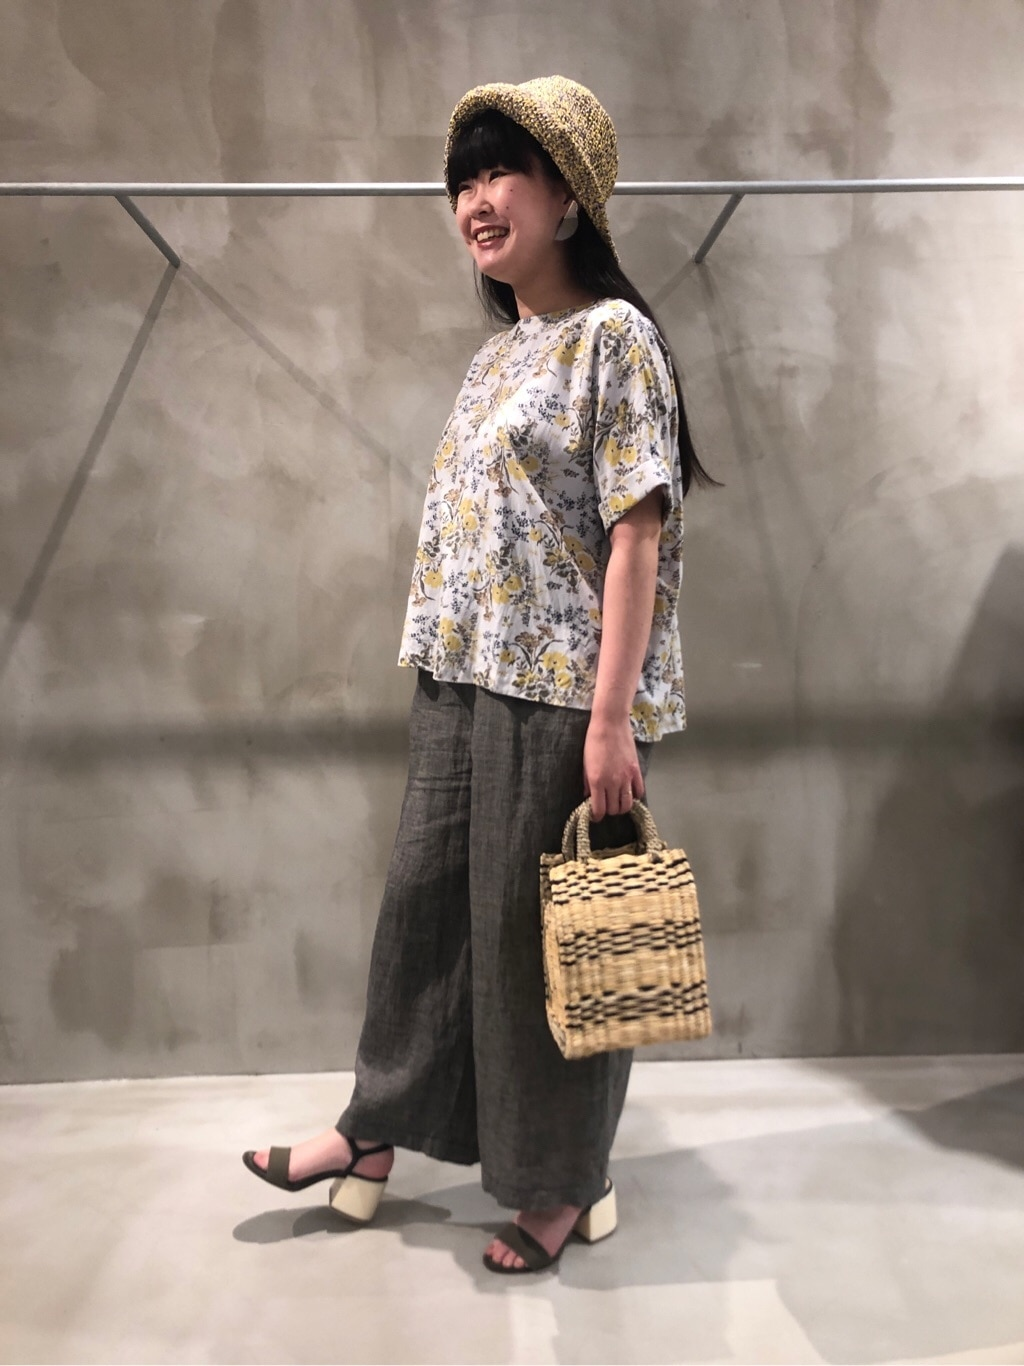 bulle de savon 渋谷スクランブルスクエア 身長:157cm 2020.06.13